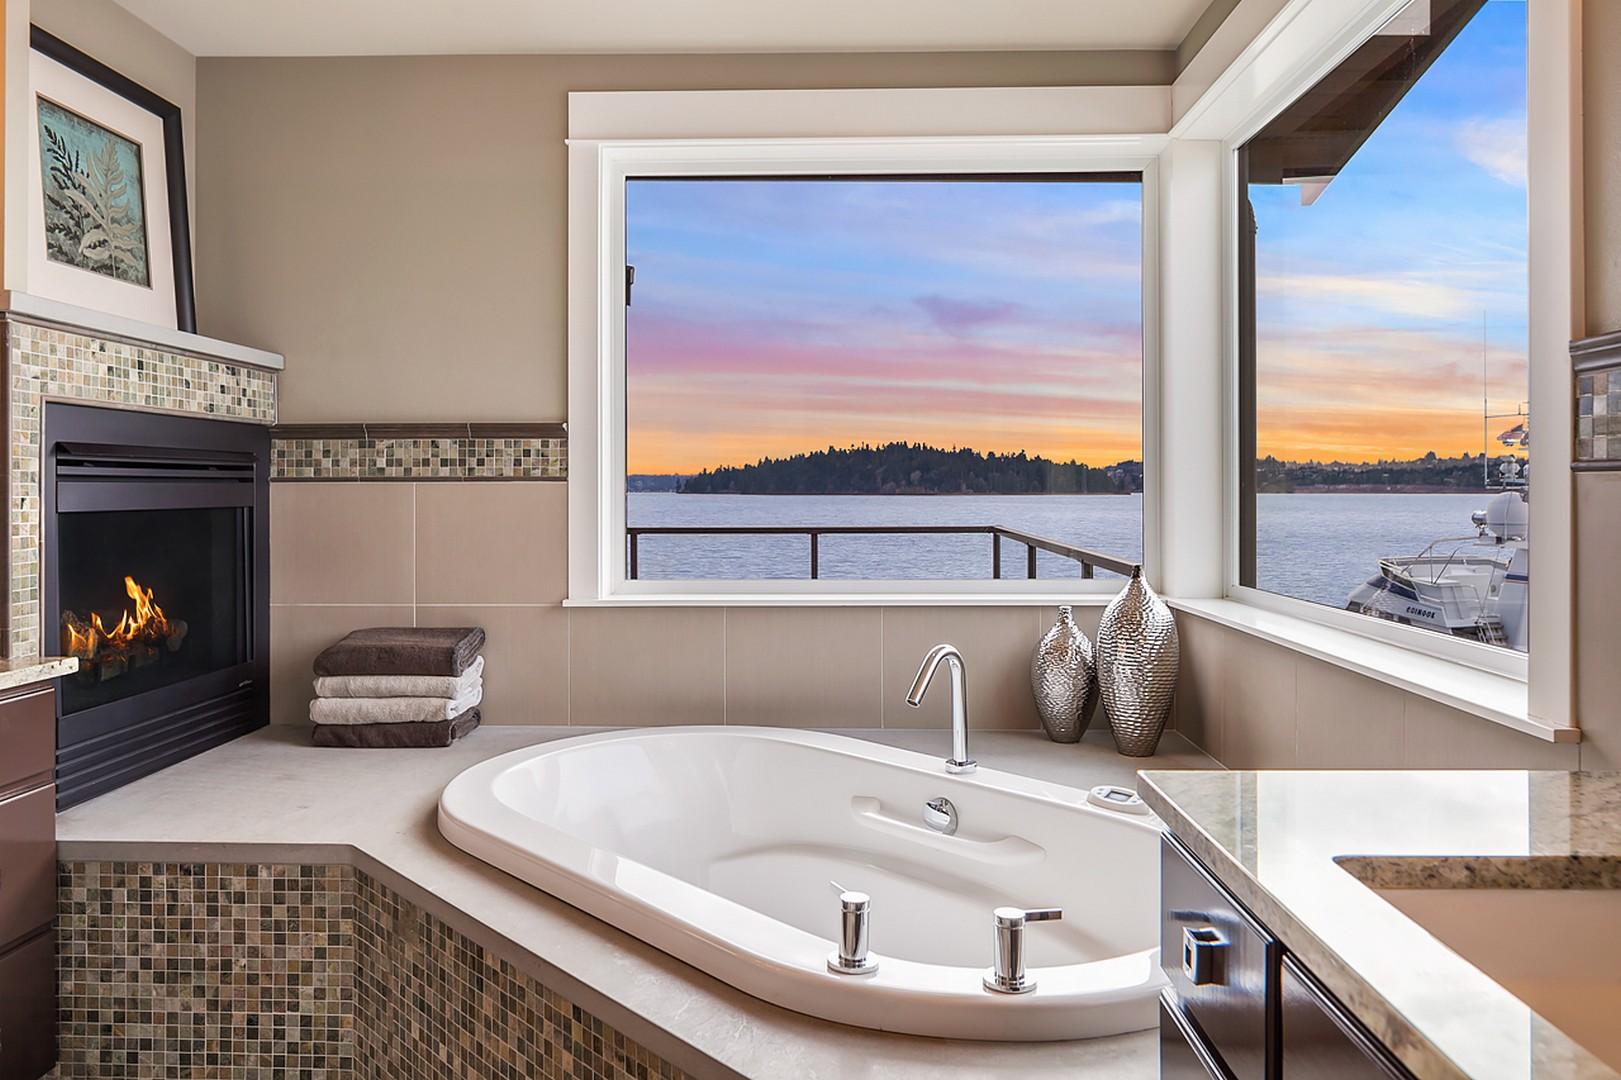 Additional photo for property listing at 3661 West Mercer Wy  Mercer Island, Washington 98040 United States